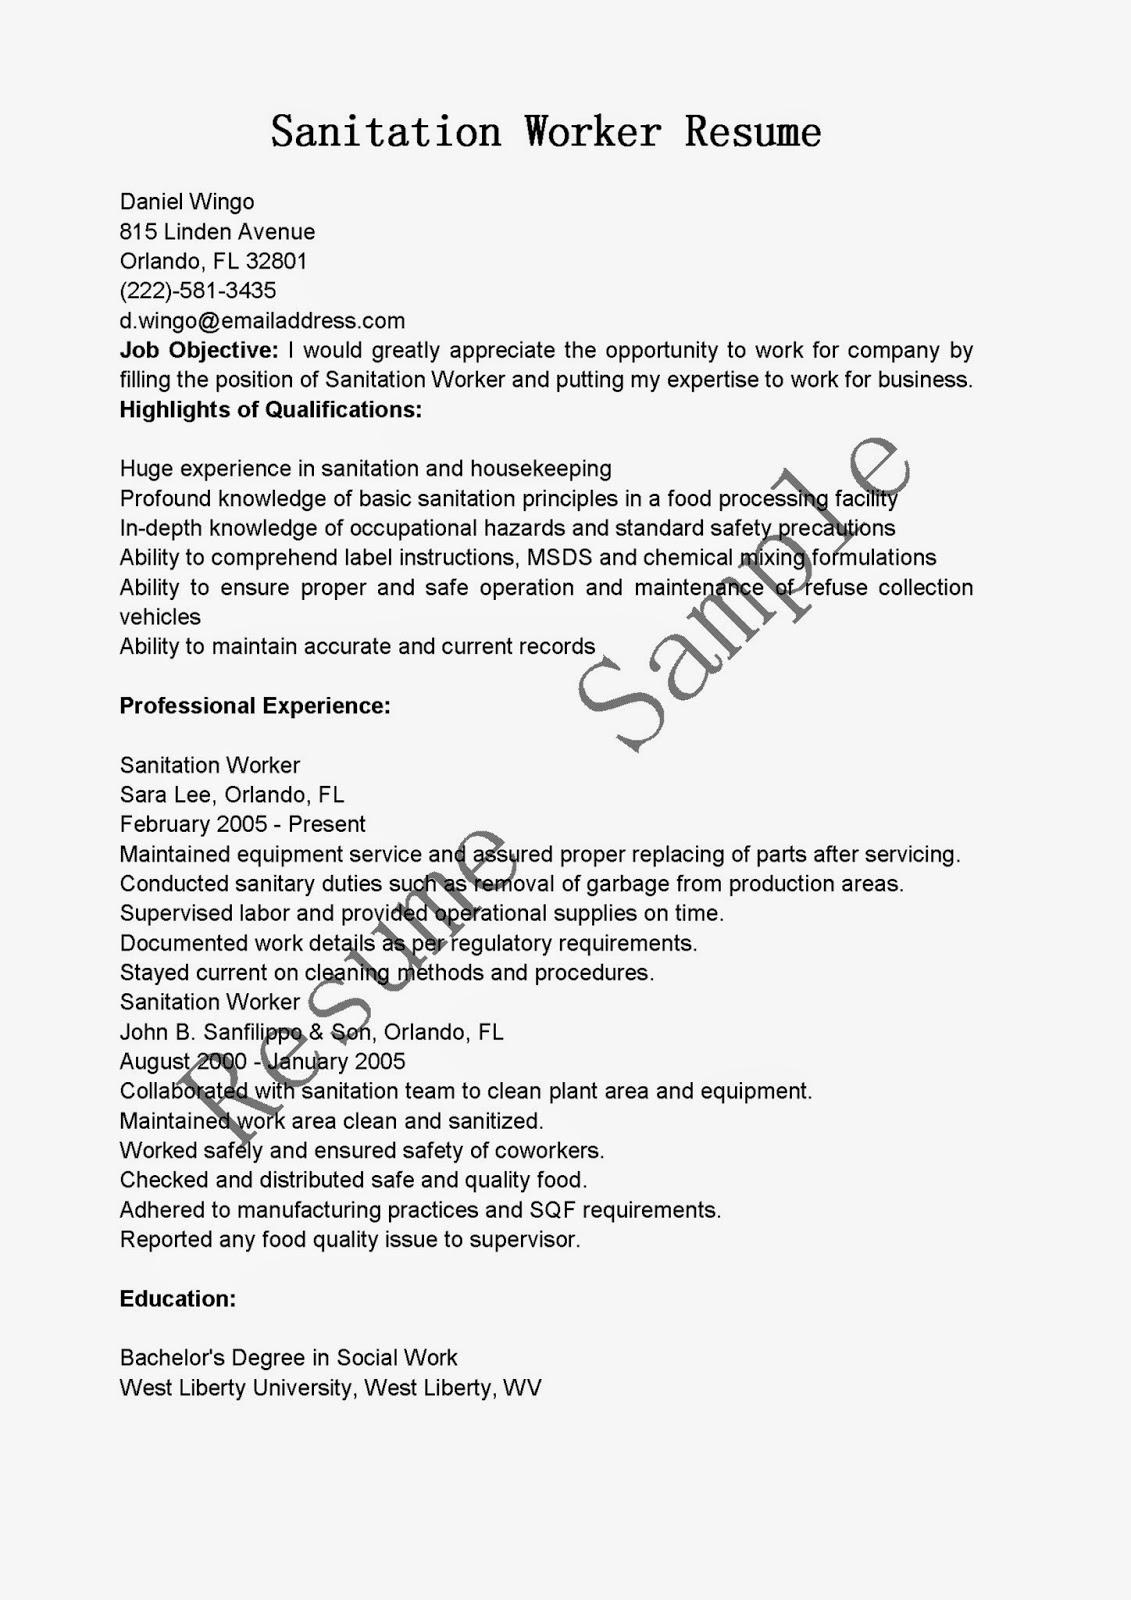 sanitation worker resume